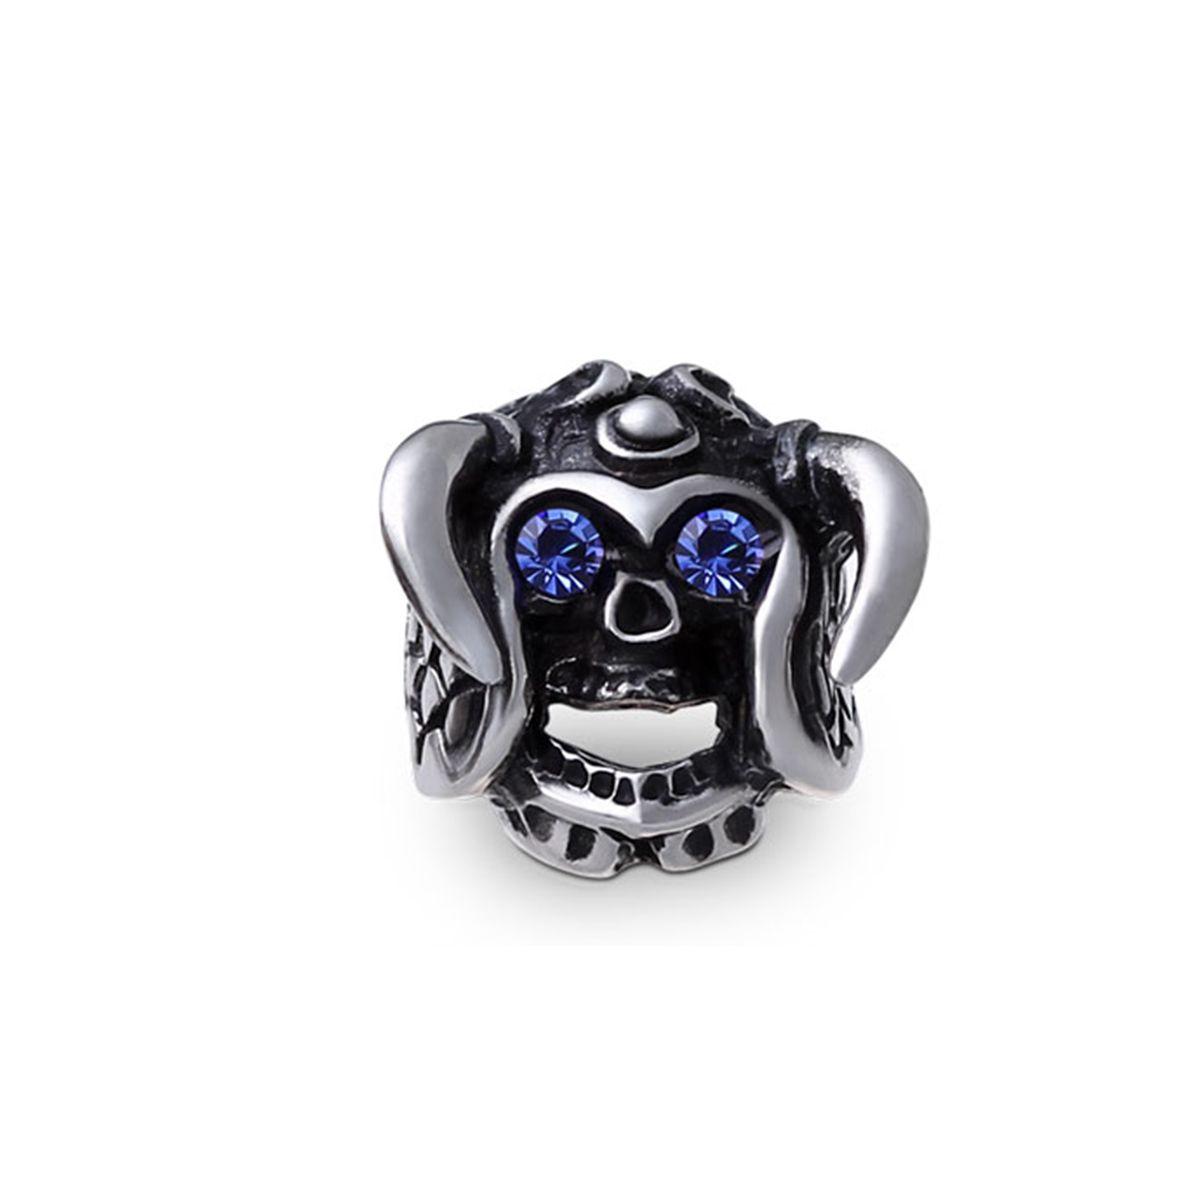 EA126 牛魔大王耳環/單隻販售